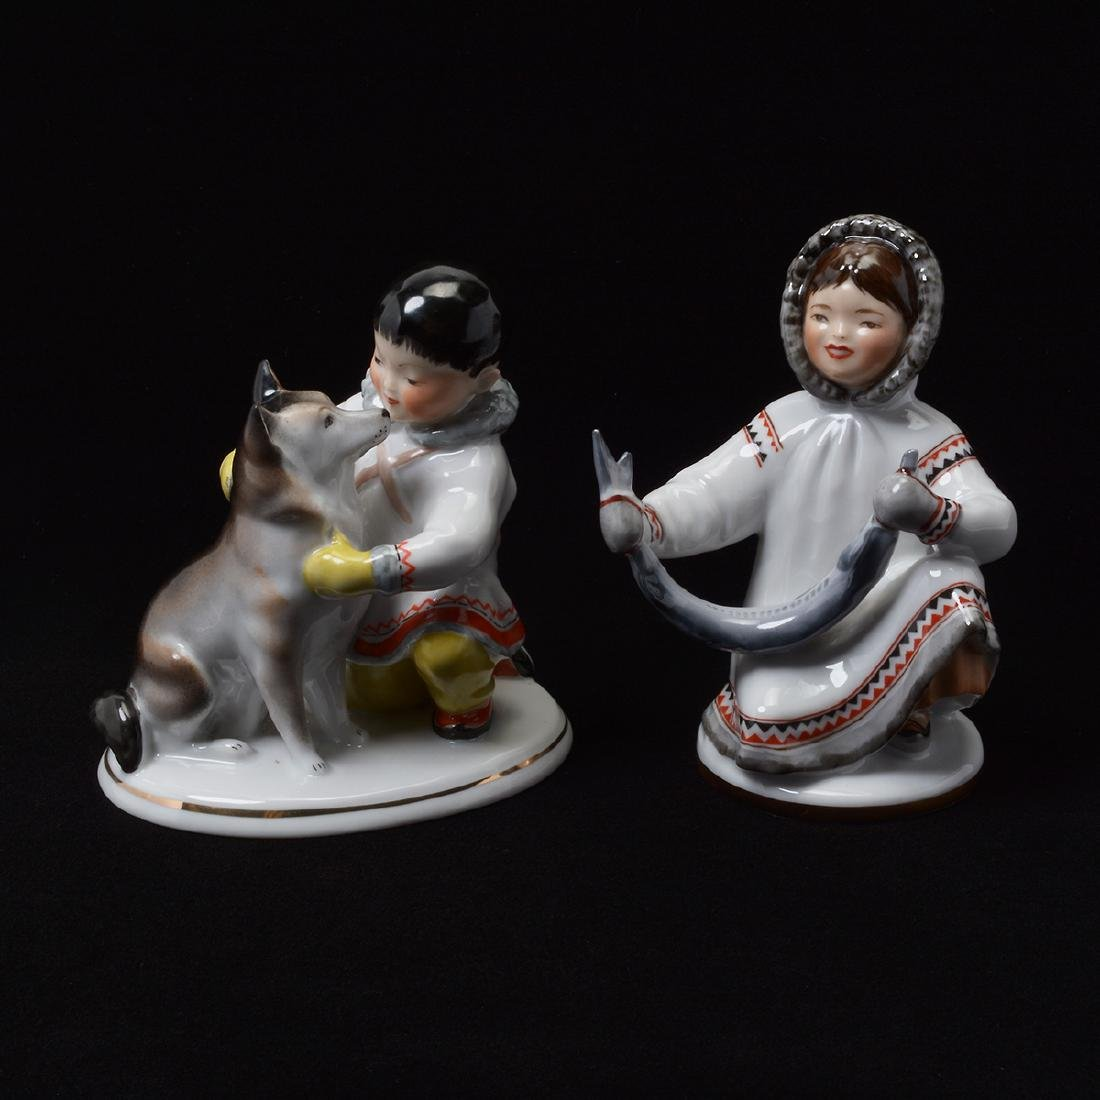 Pair of Lomonosov Porcelain Figures